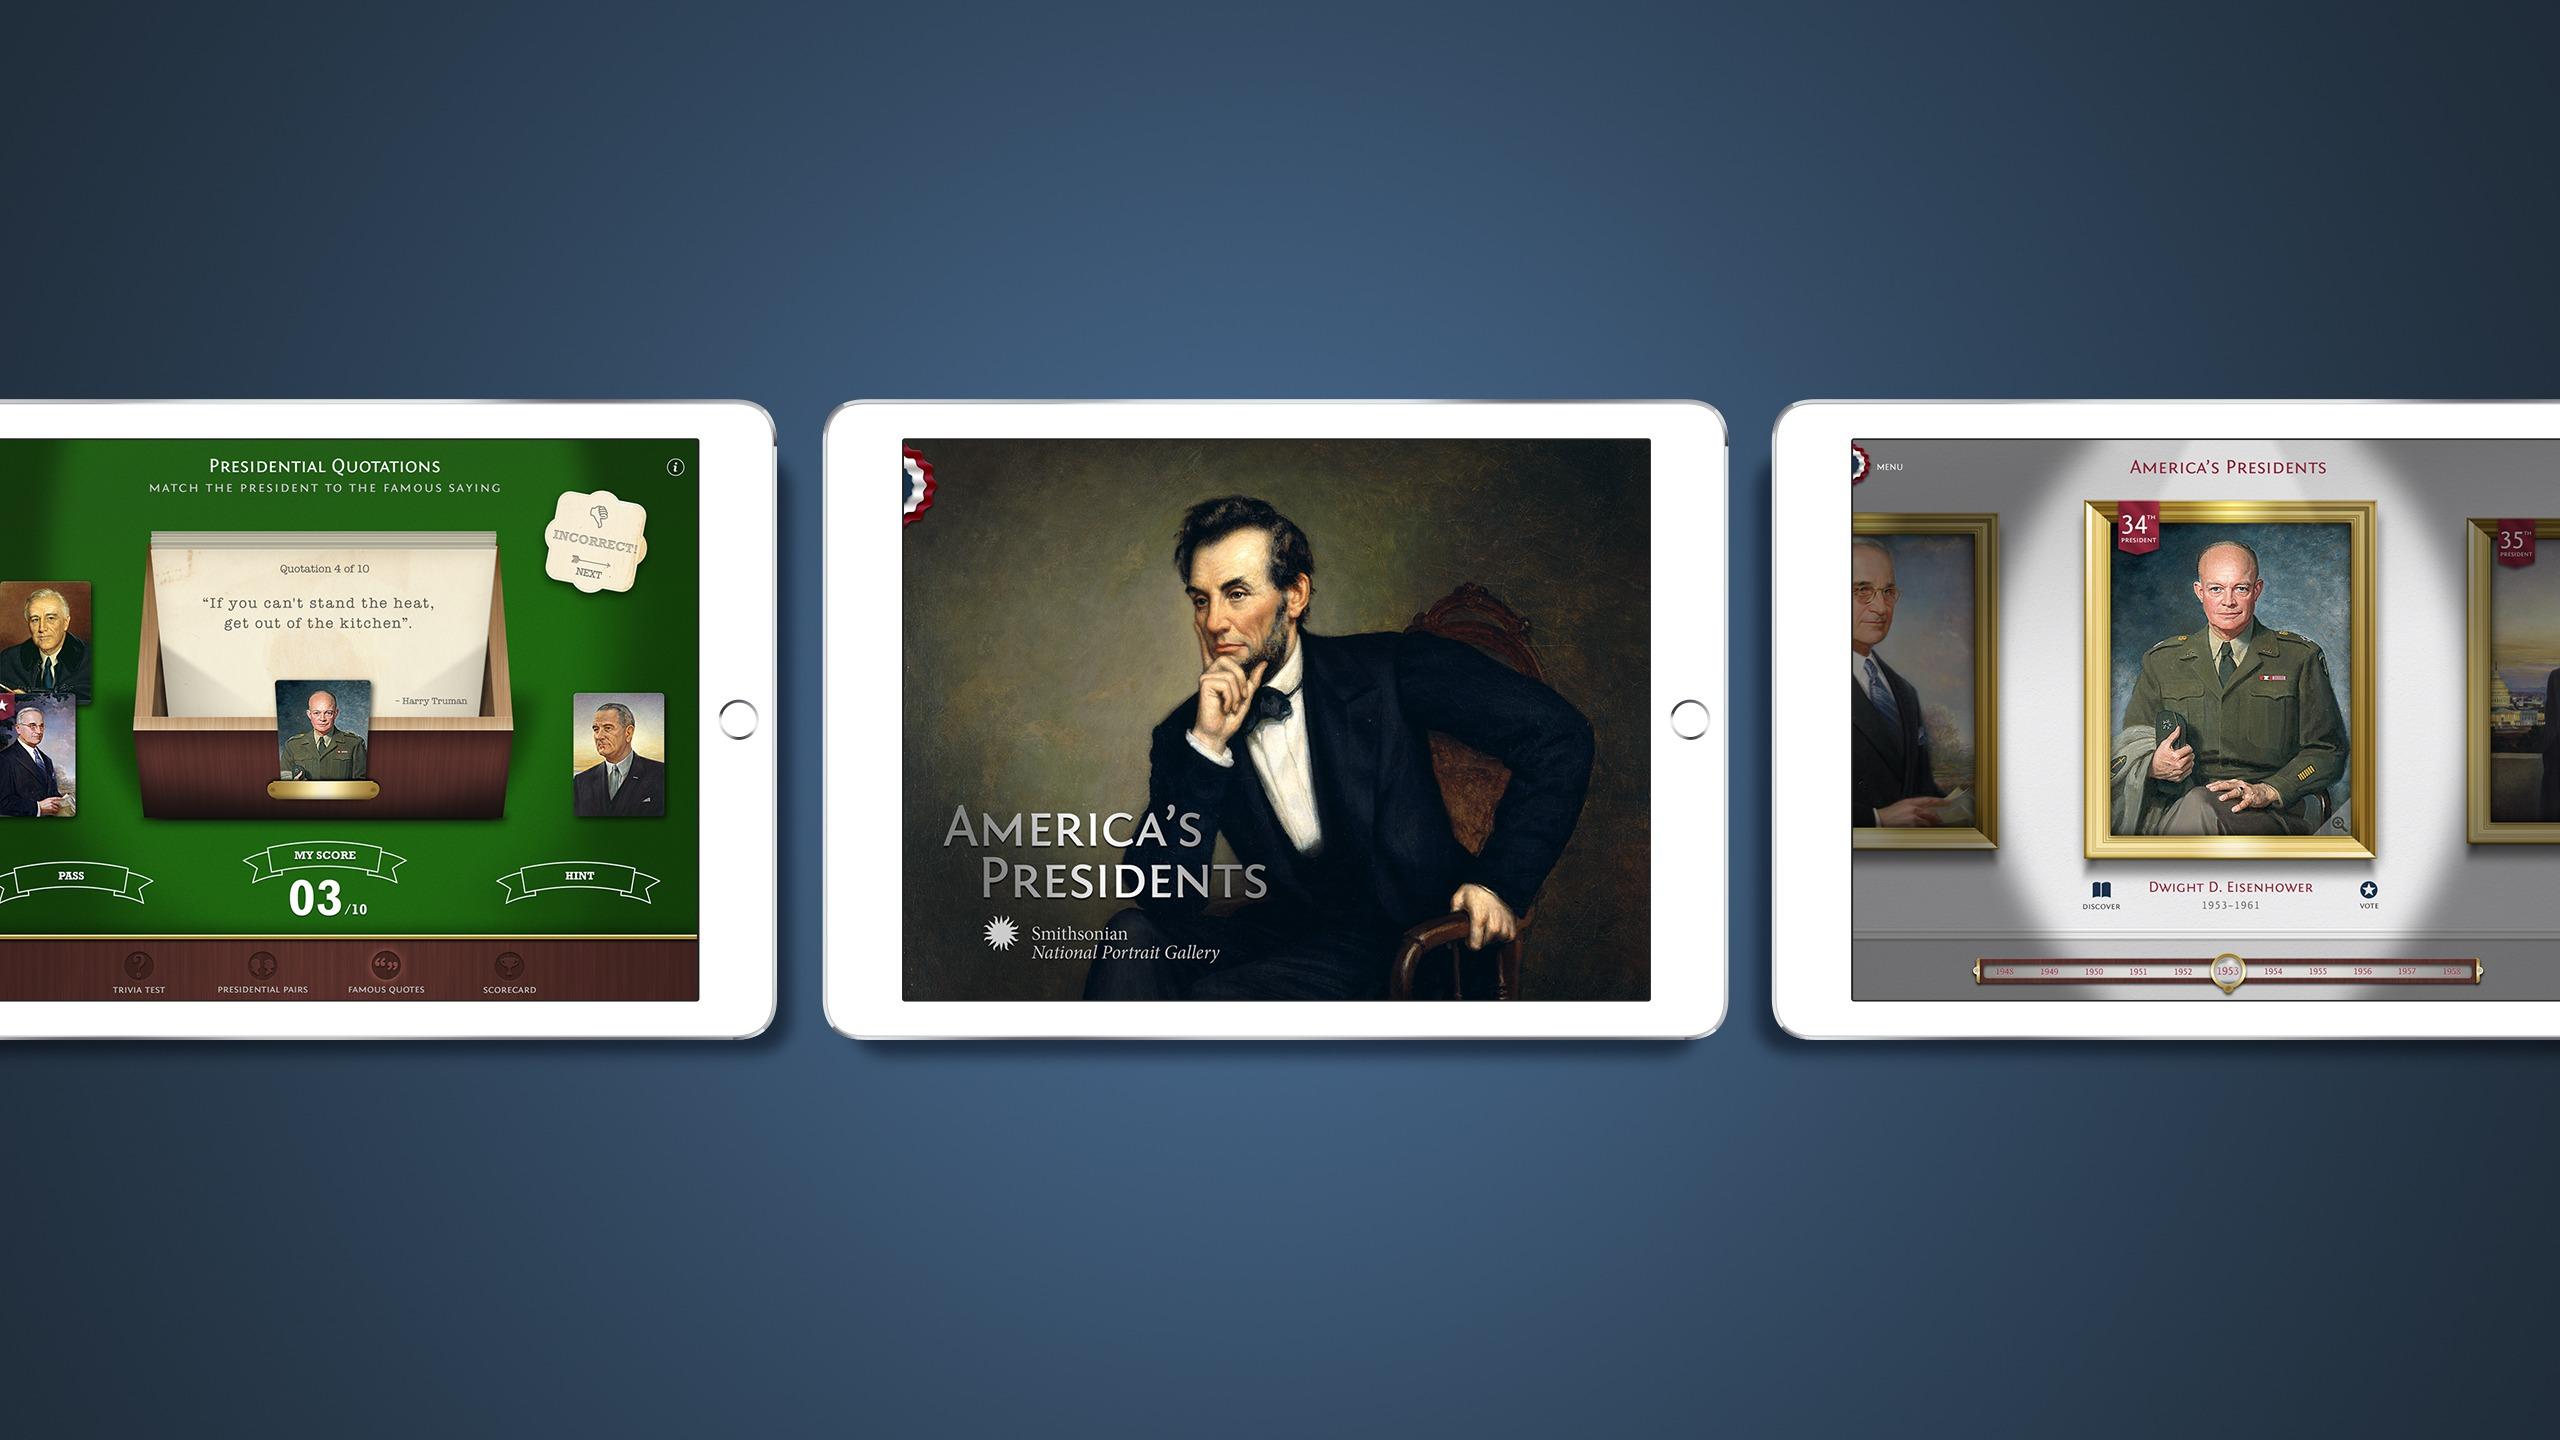 Americas Presidents app